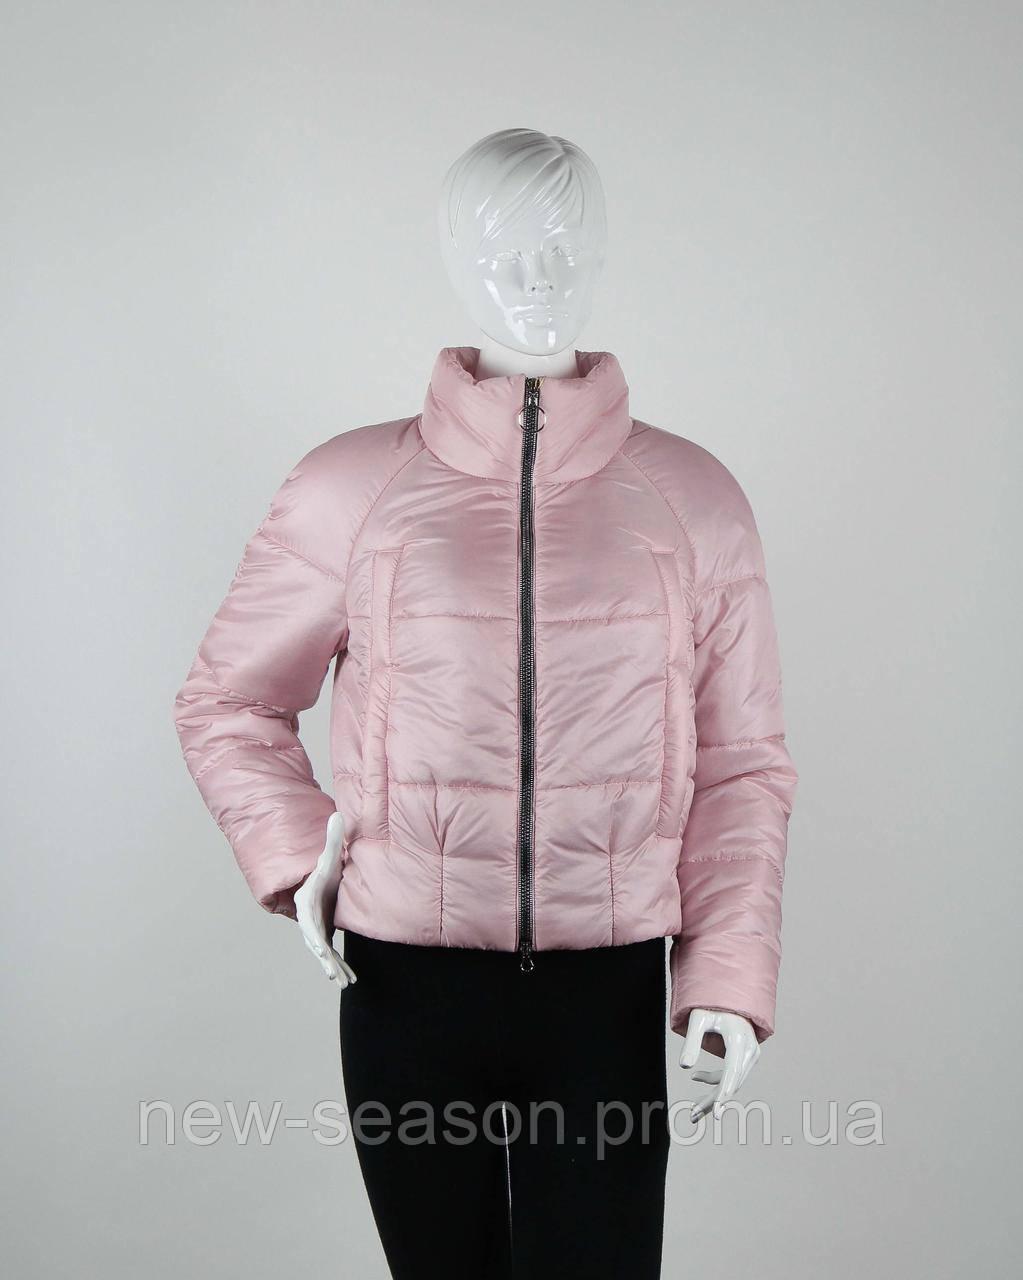 Куртка демисезонная бомбер Goods Fancy 2706 pink